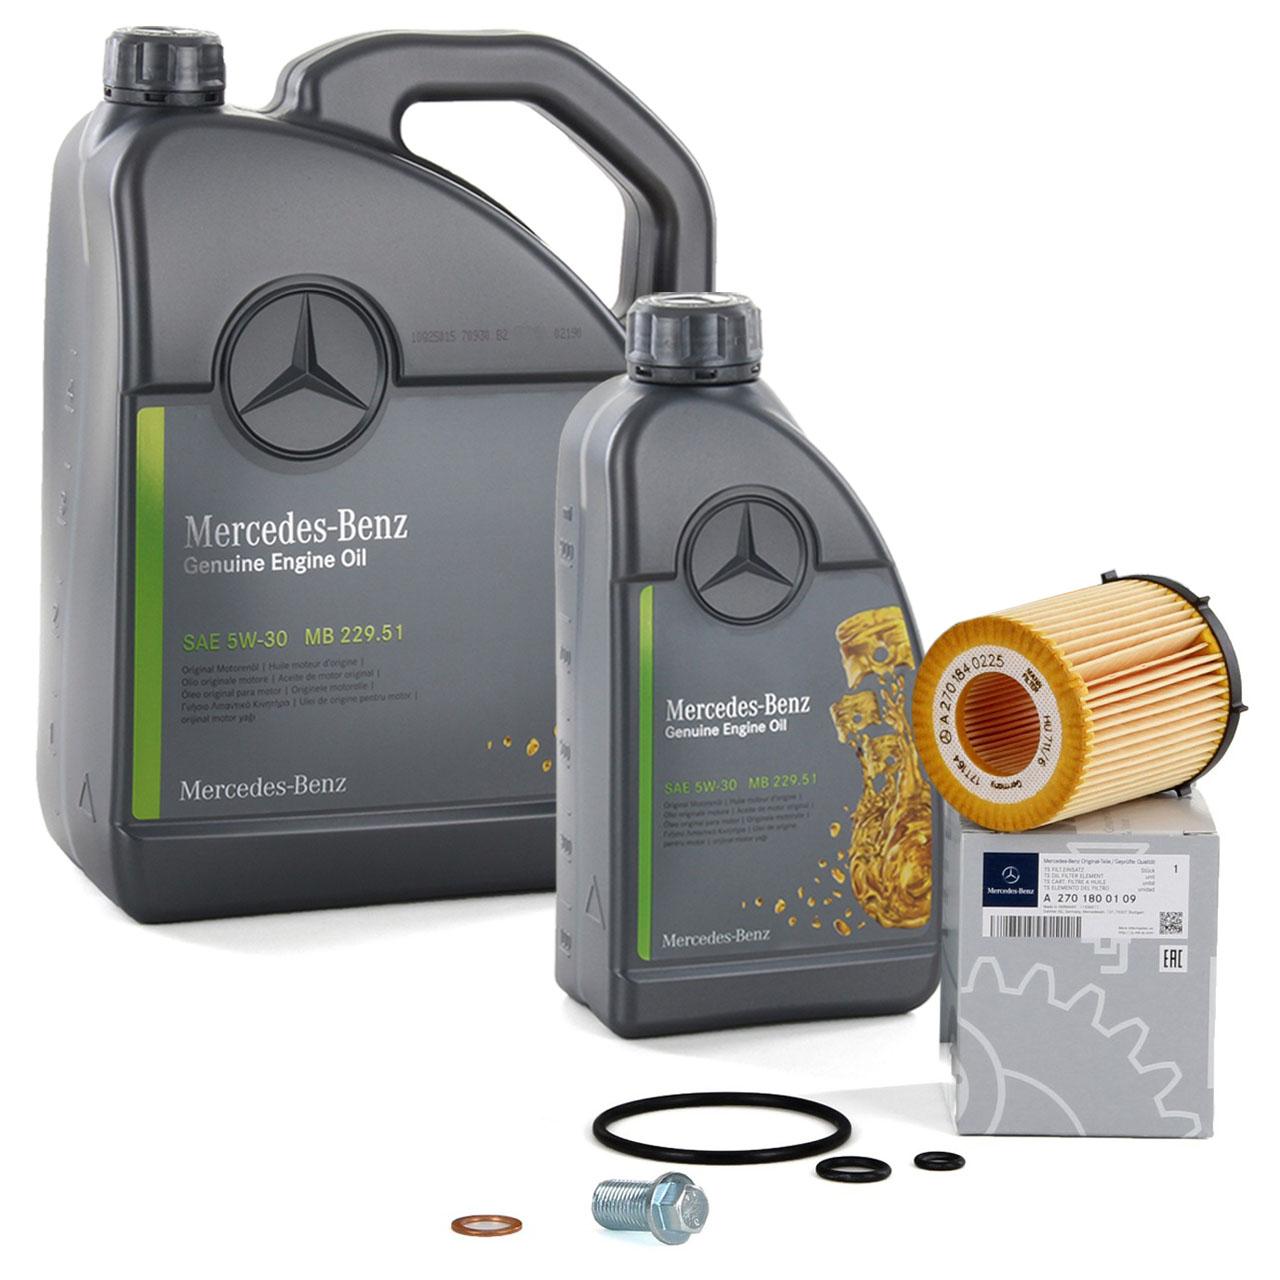 6 Liter ORIGINAL Mercedes-Benz ÖL Motoröl 5W30 MB 229.51 + Ölfilter 2701800109